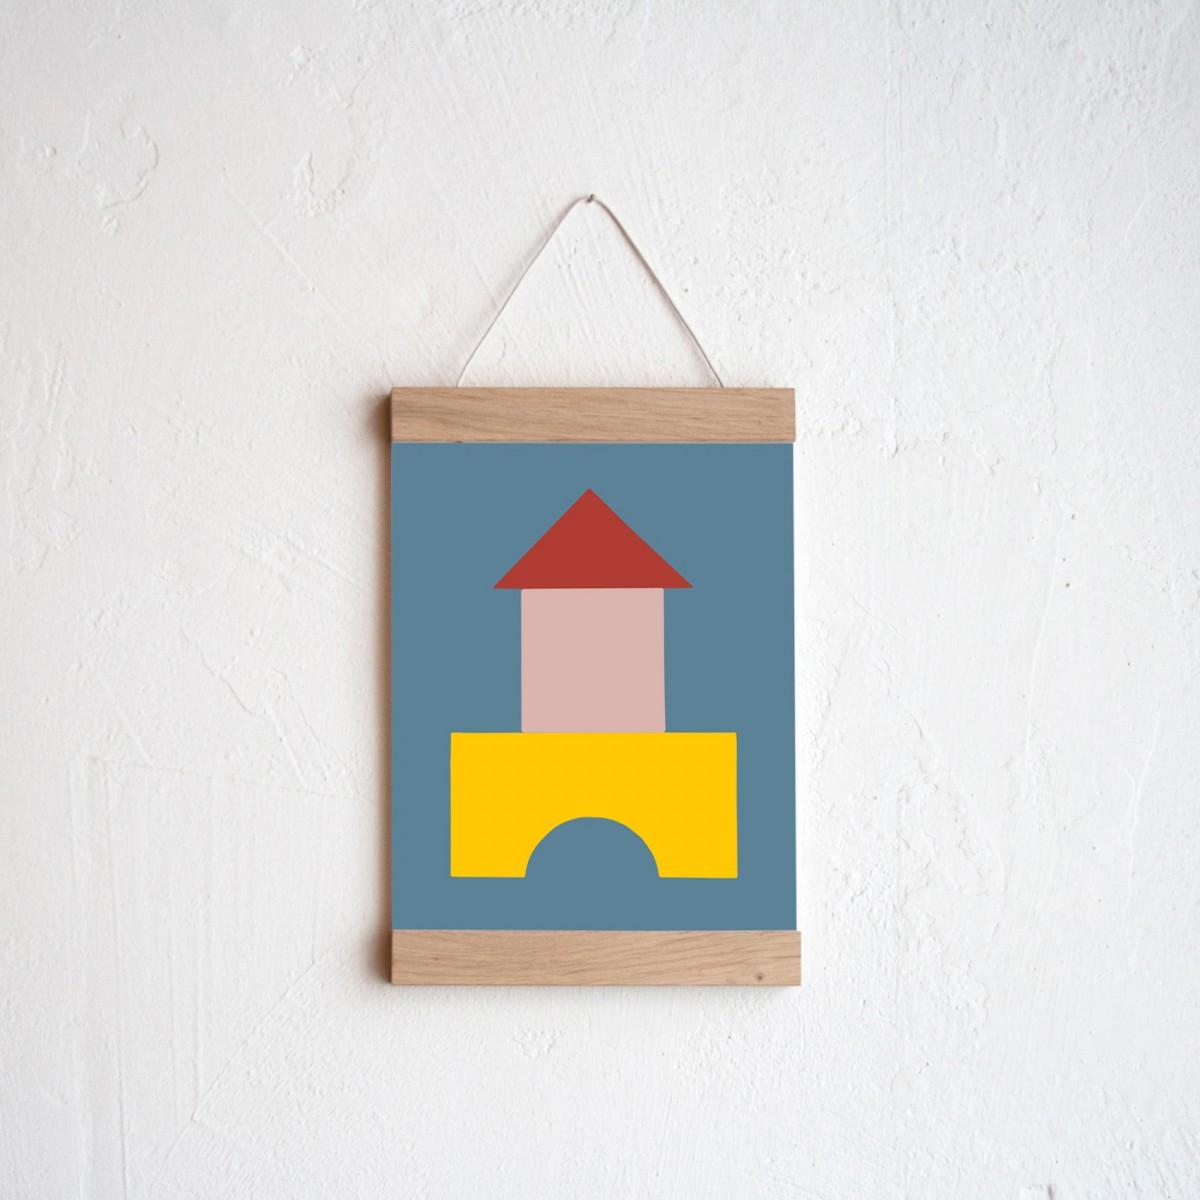 Bauklotz Poster #1 + Posterleiste Eiche A5